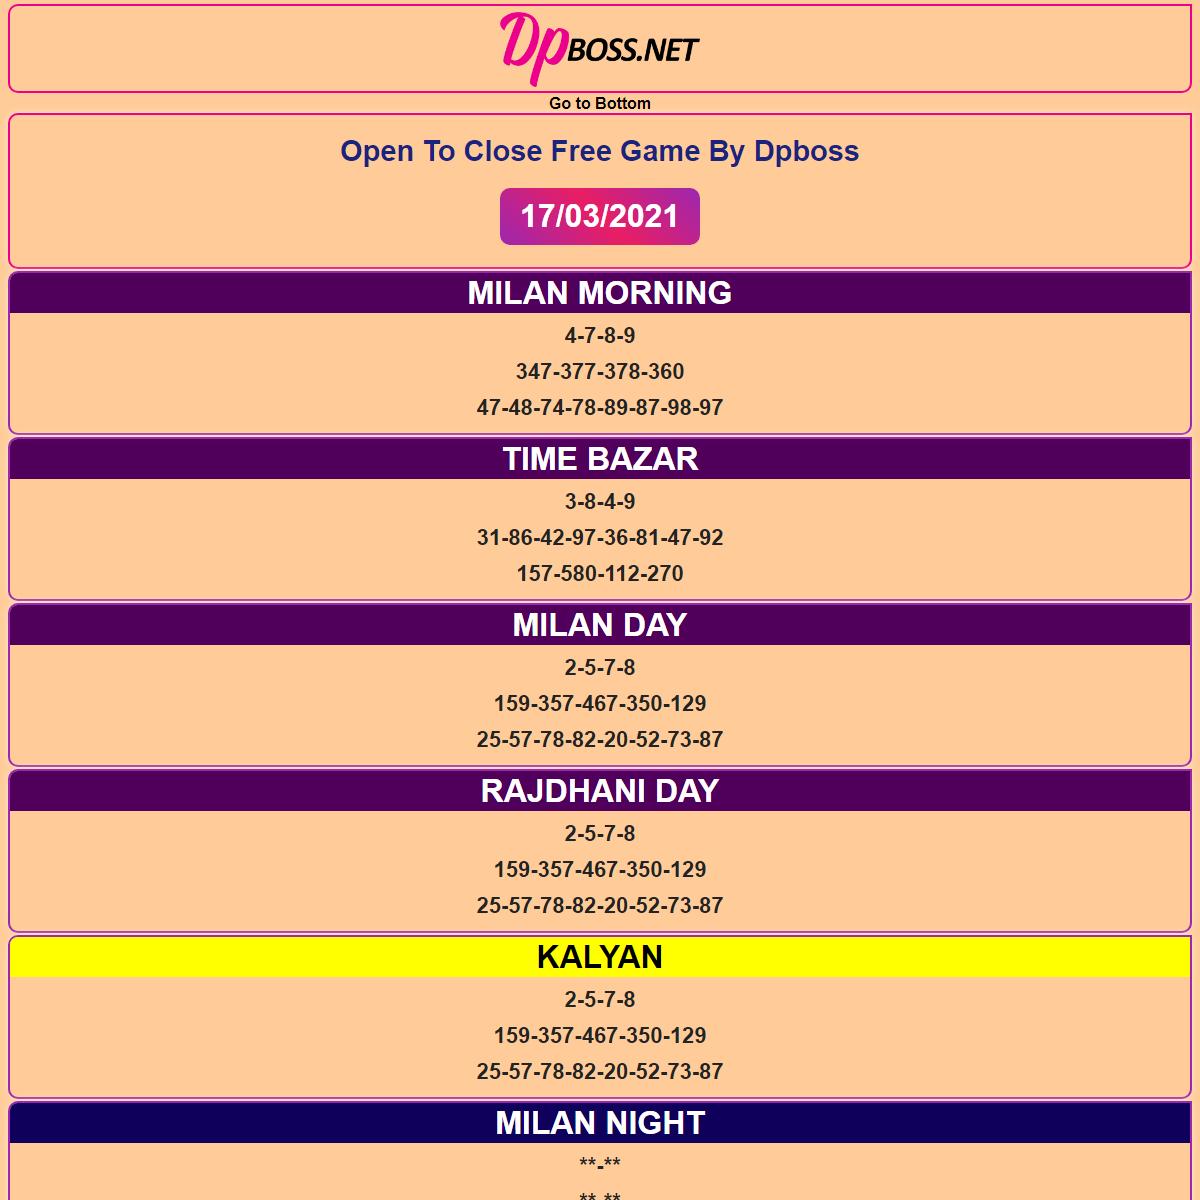 Dpboss Fix Matka Satta Number Final Ank Kalyan Fix Single Jodi Today